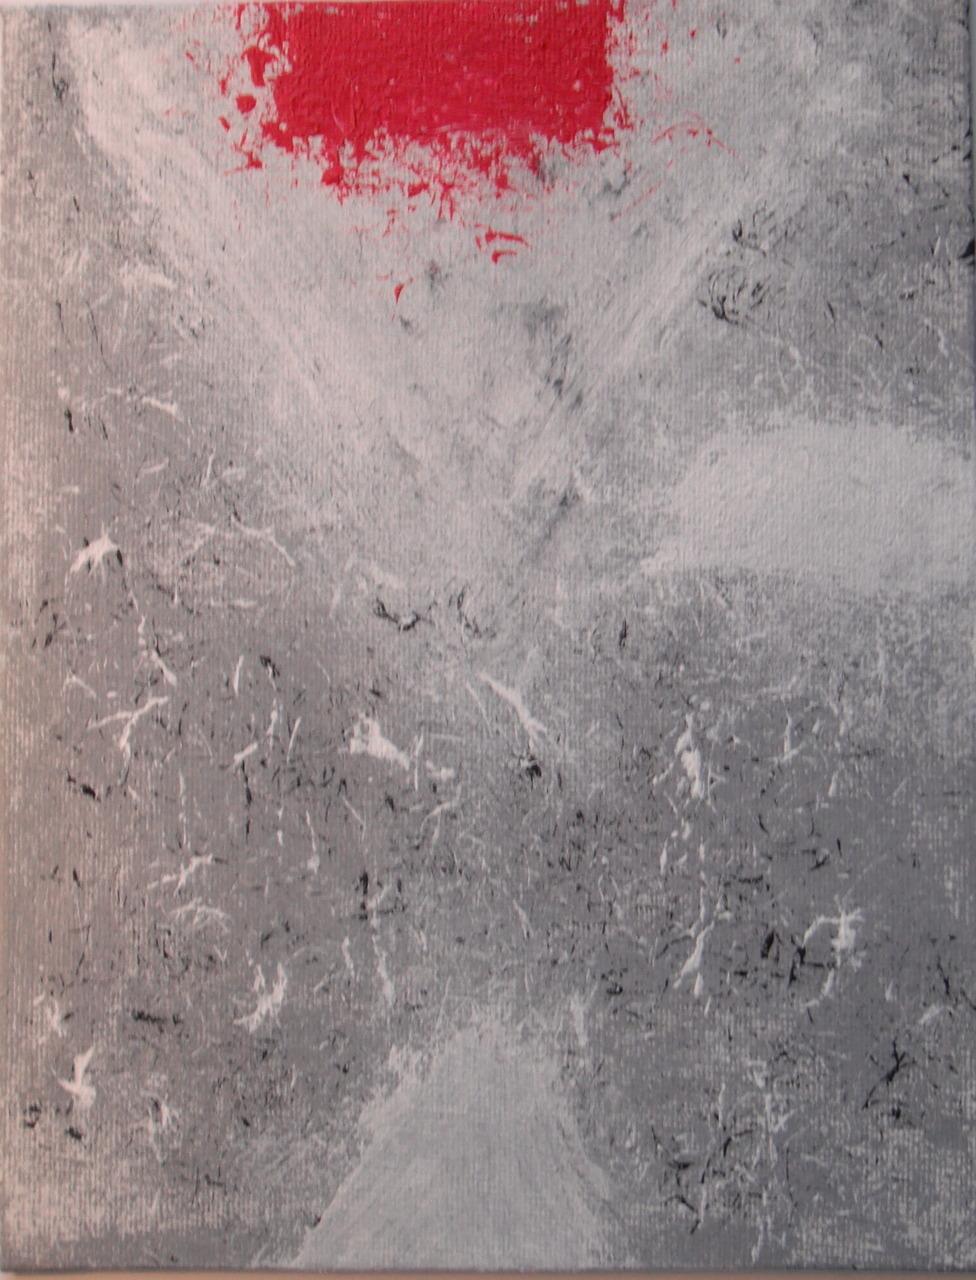 Graham Clark is a painter